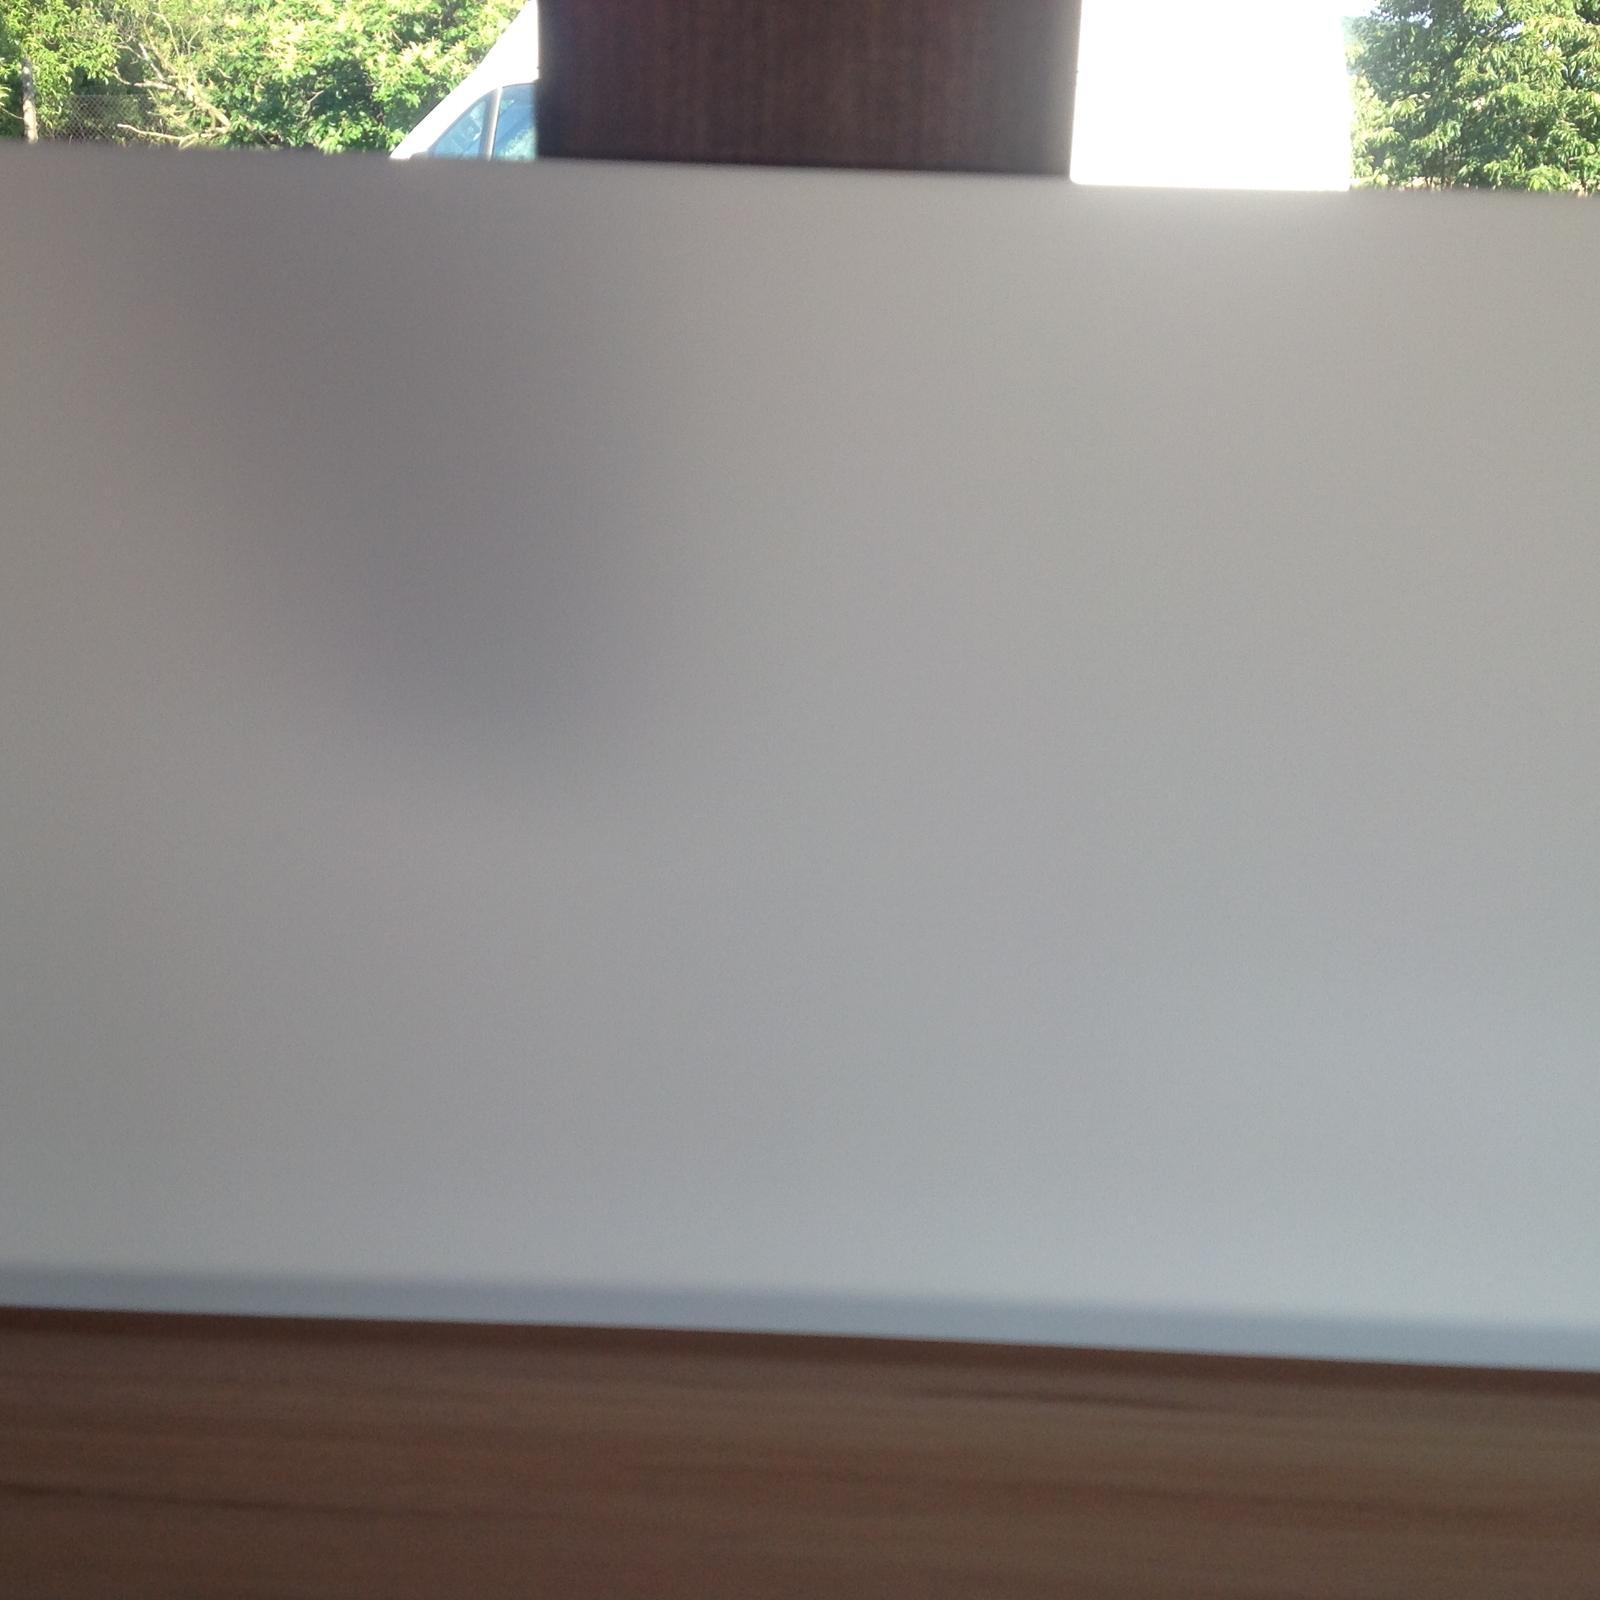 Midian bianco sciana bledosedy obklad 20x60cm - Obrázok č. 1